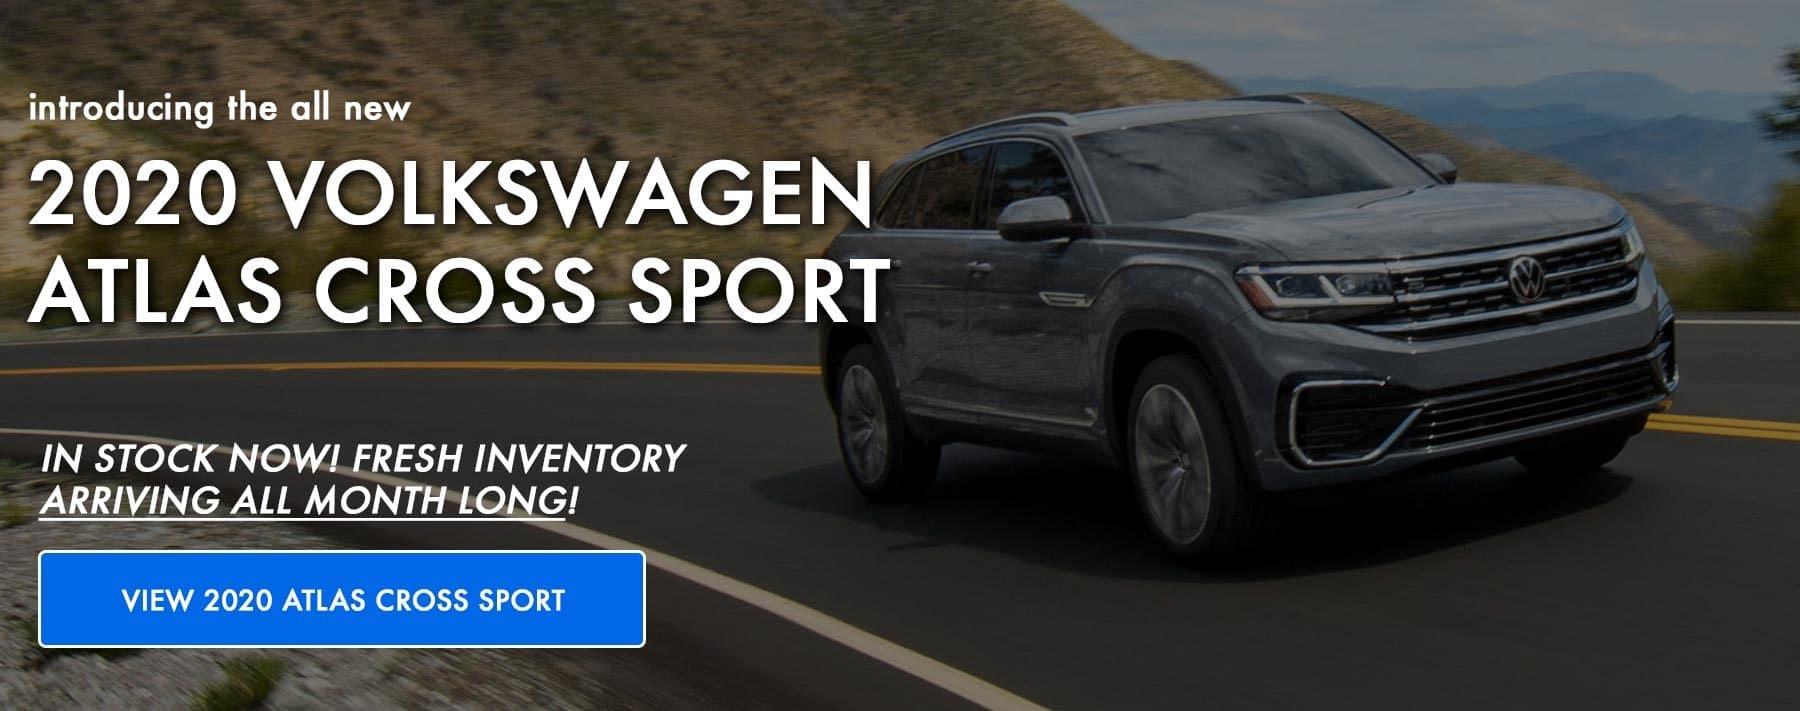 View the all new VW 2020 Atlas Cross Sport